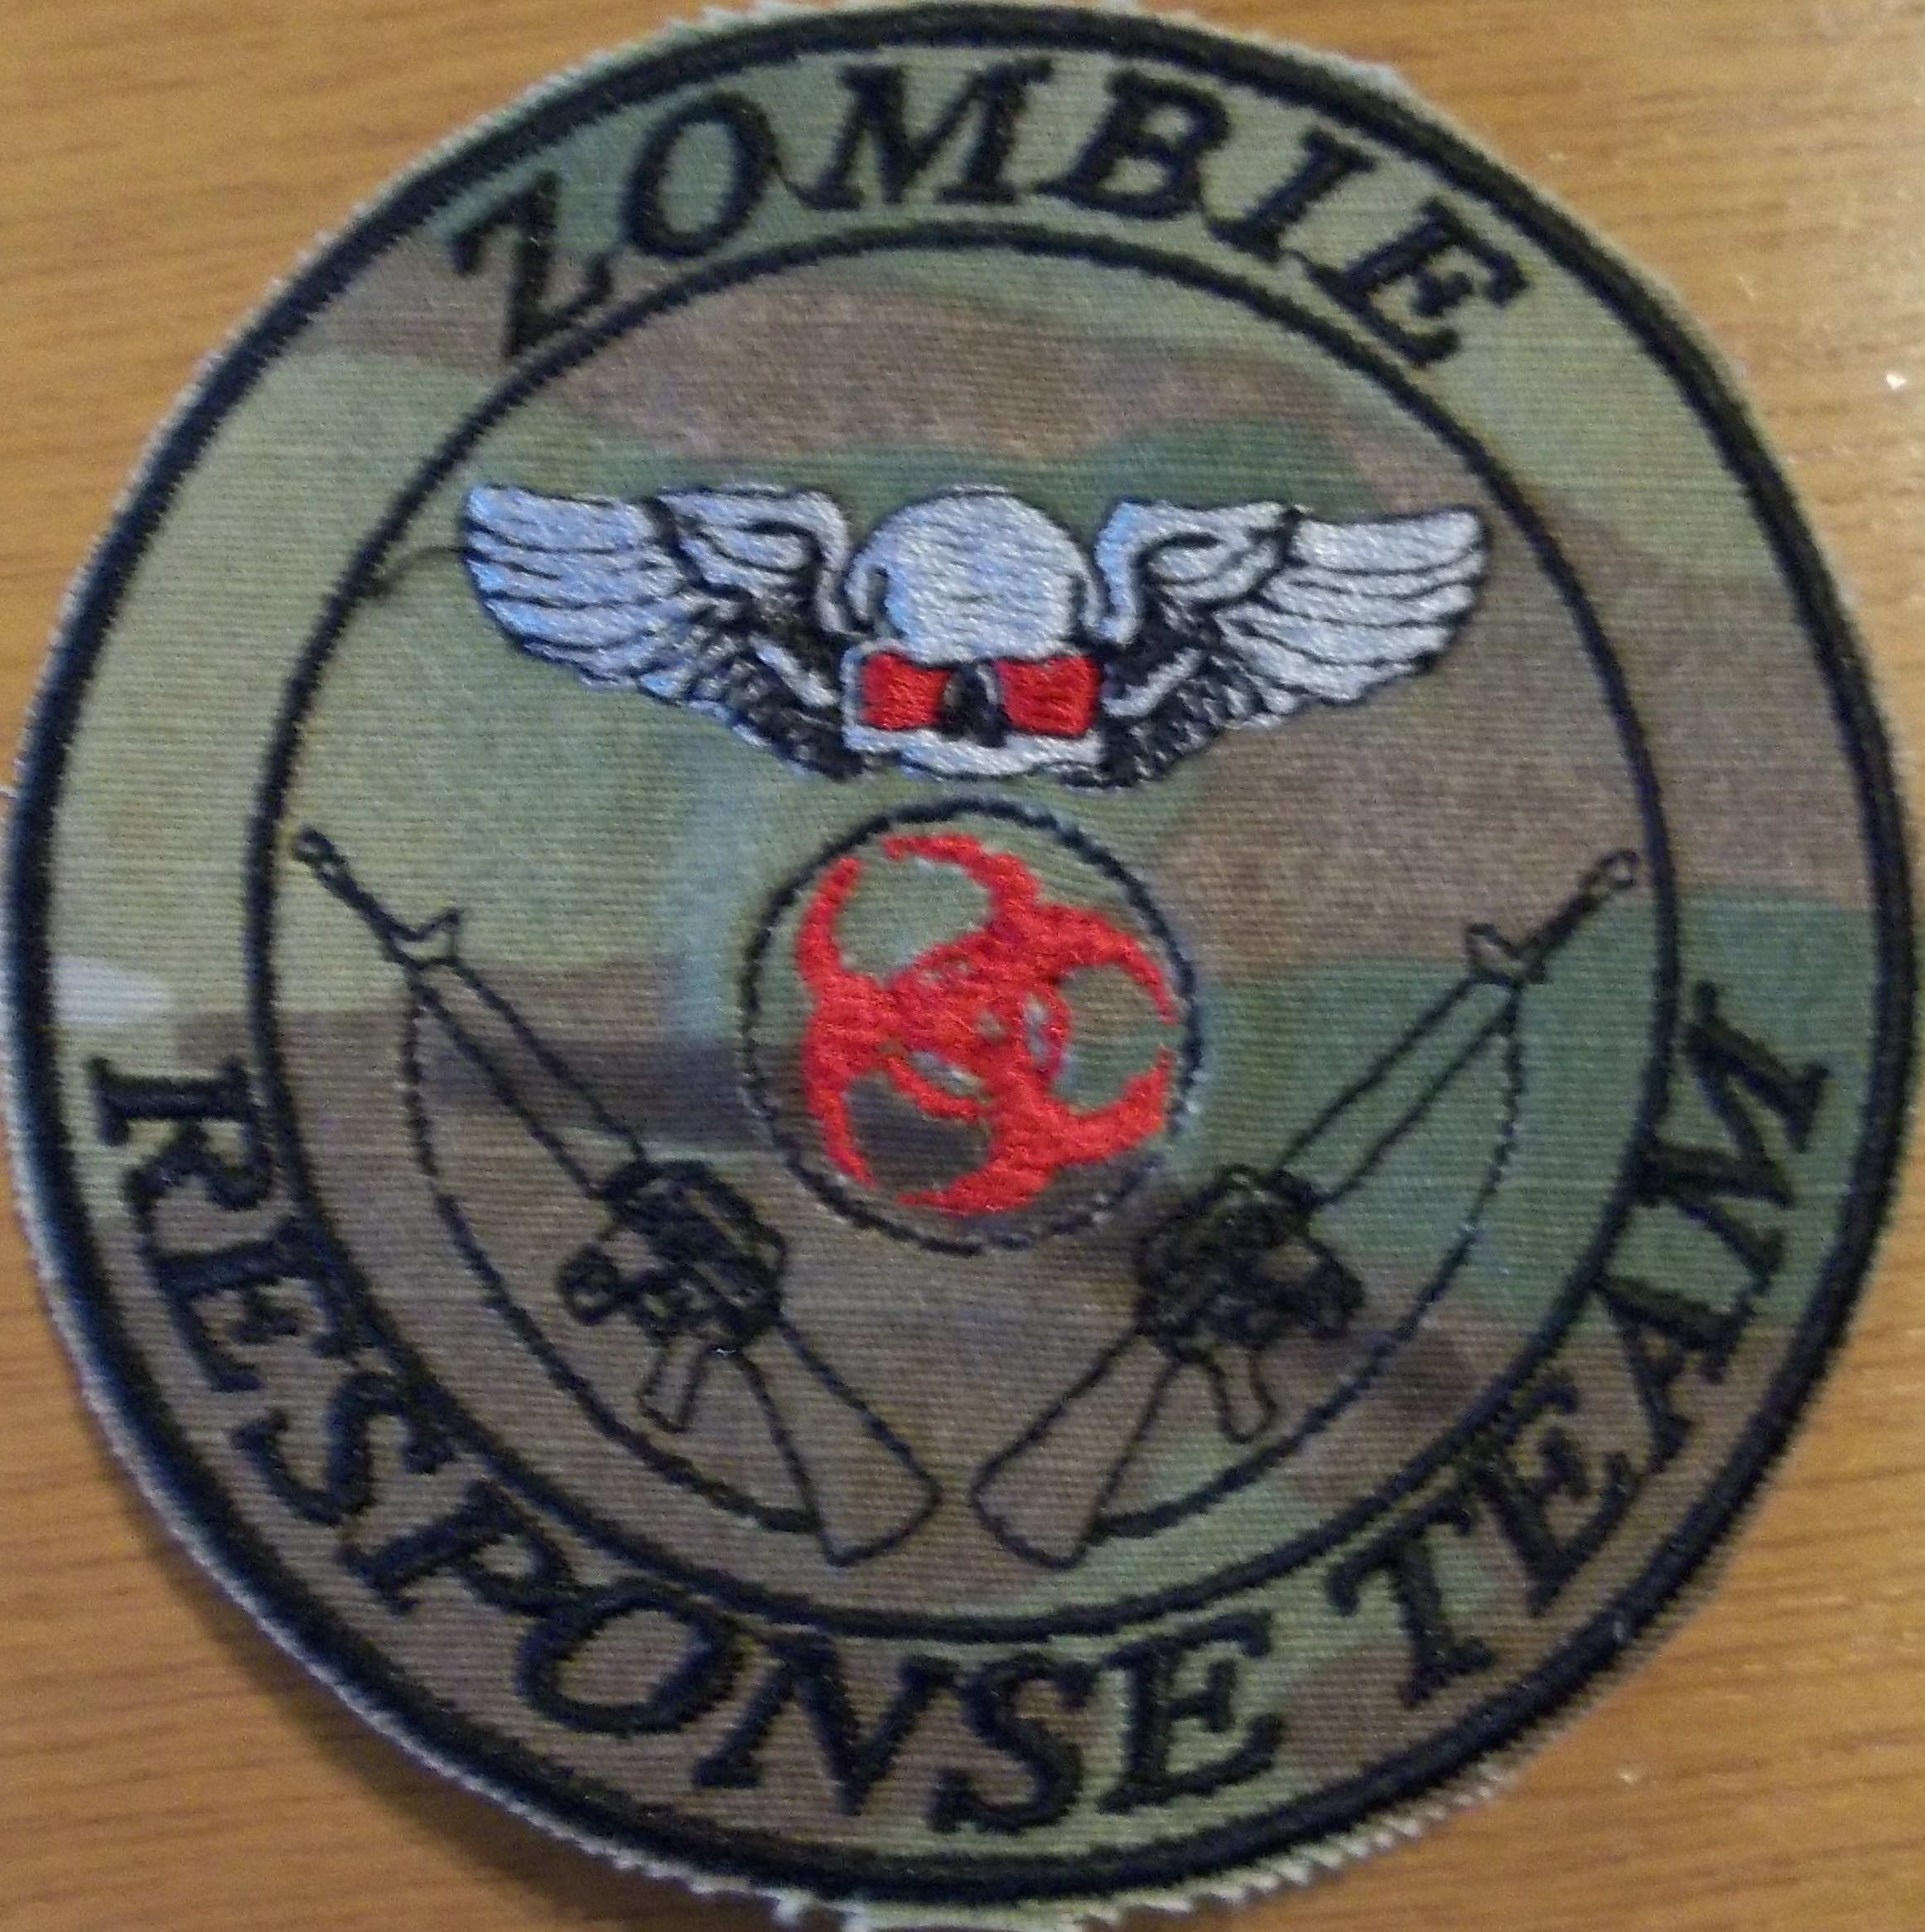 zombie-response-team PATCH.jpg